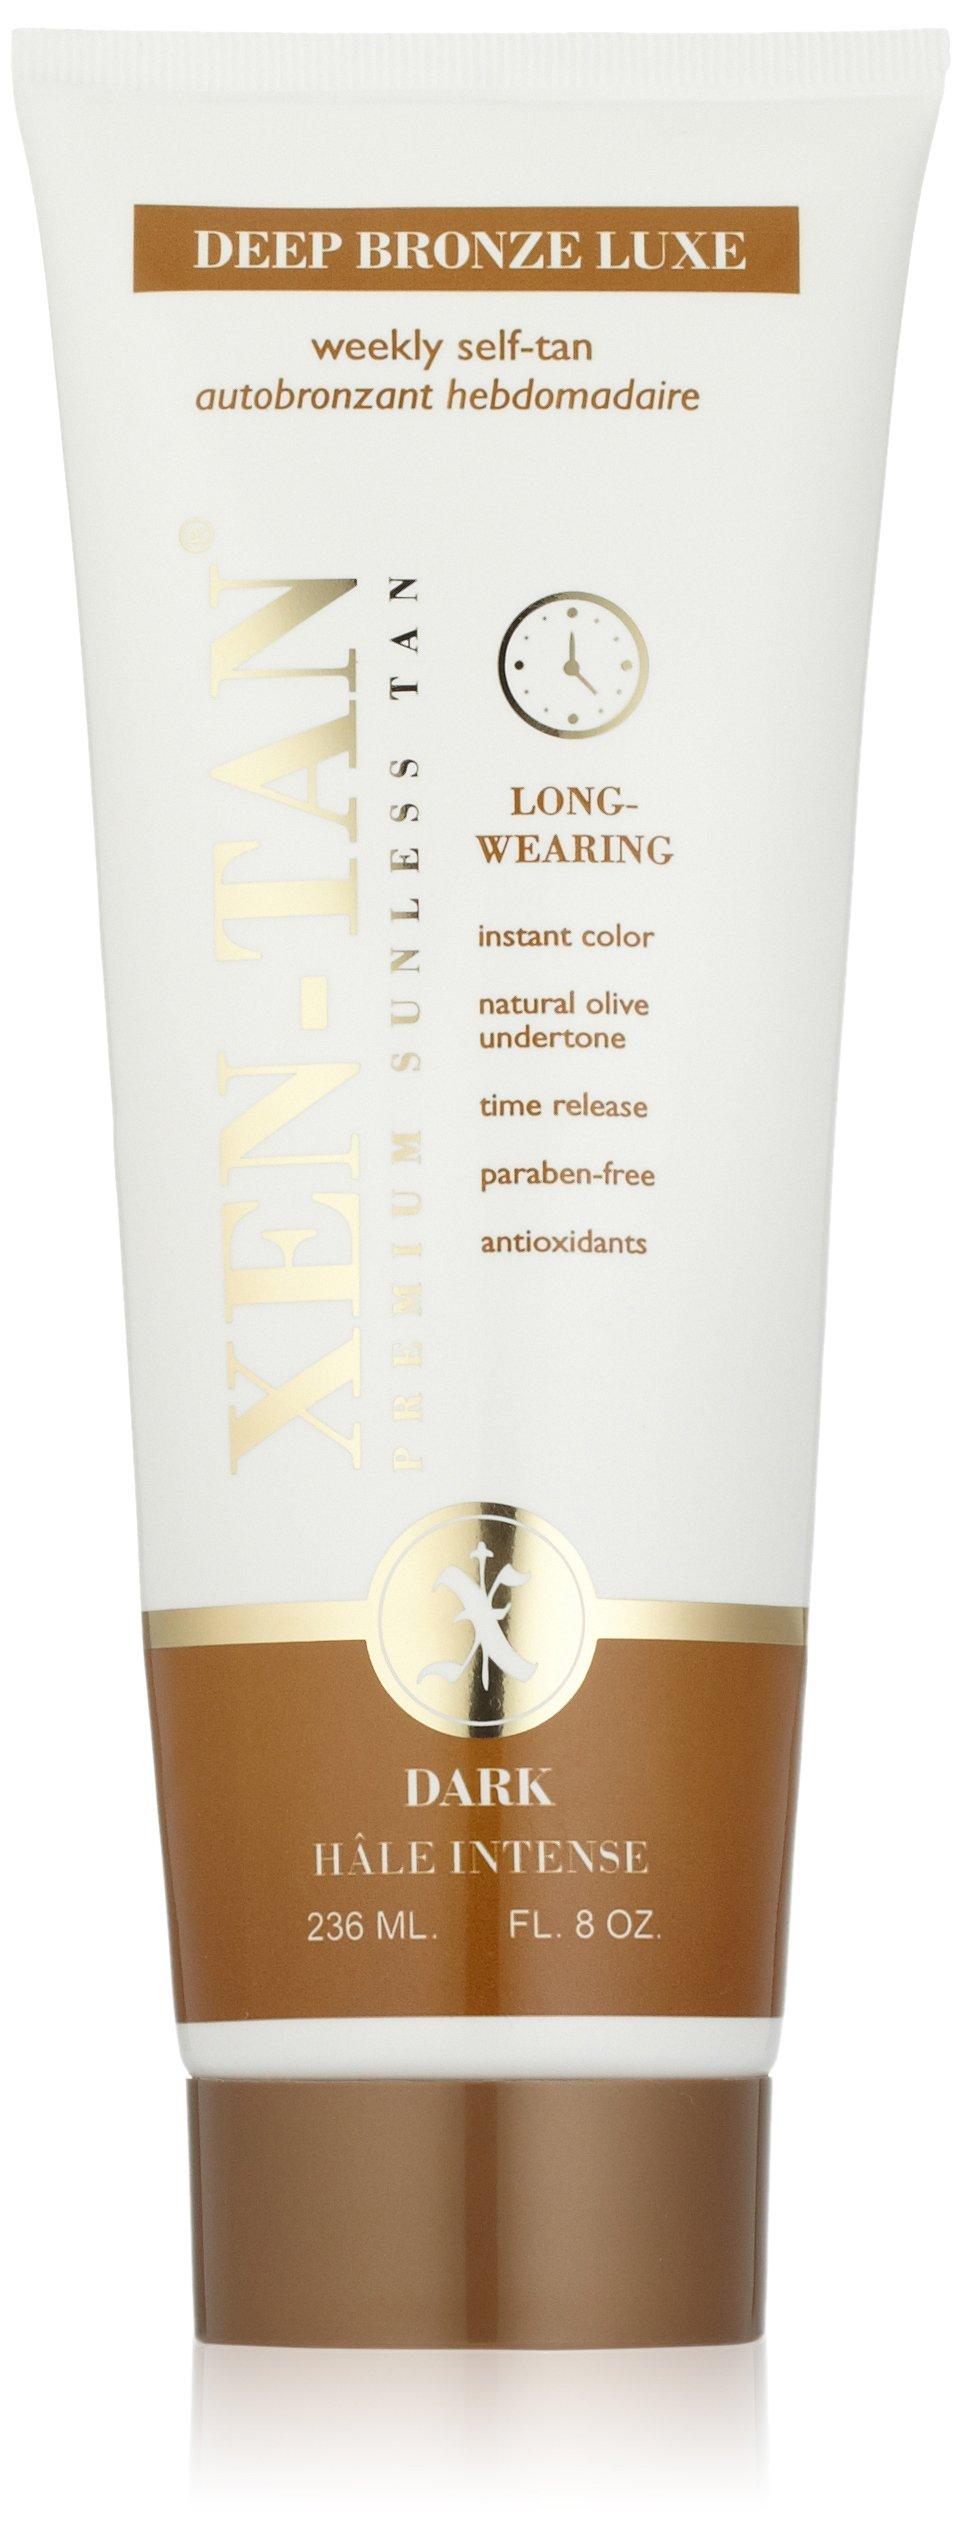 XEN-TAN Deep Bronze Luxe Weekly Tan, 8 Fl Oz